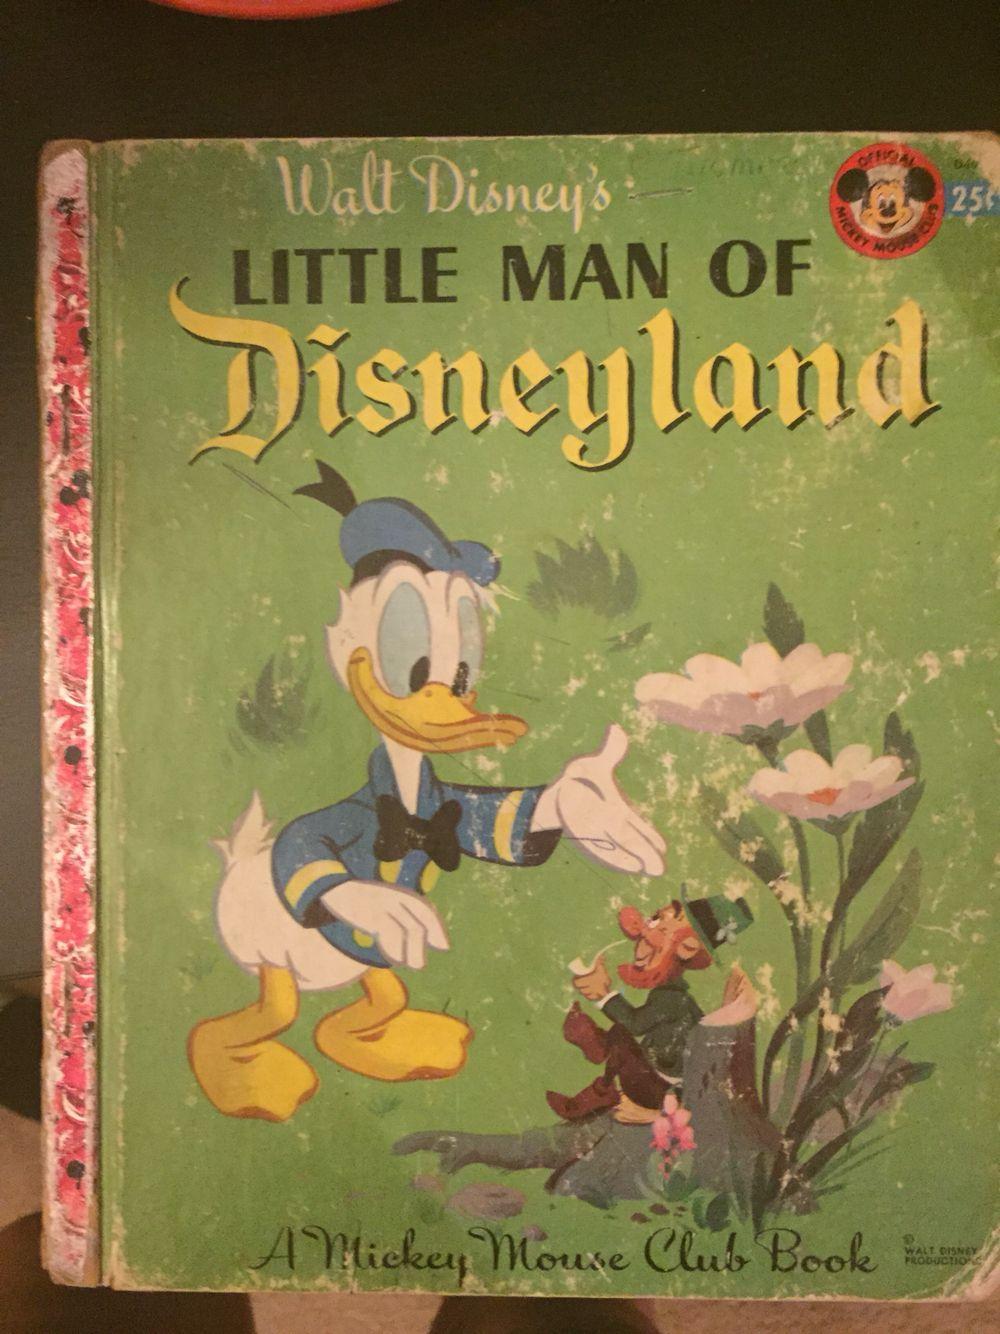 Walt Disney's Little man of Disneyland